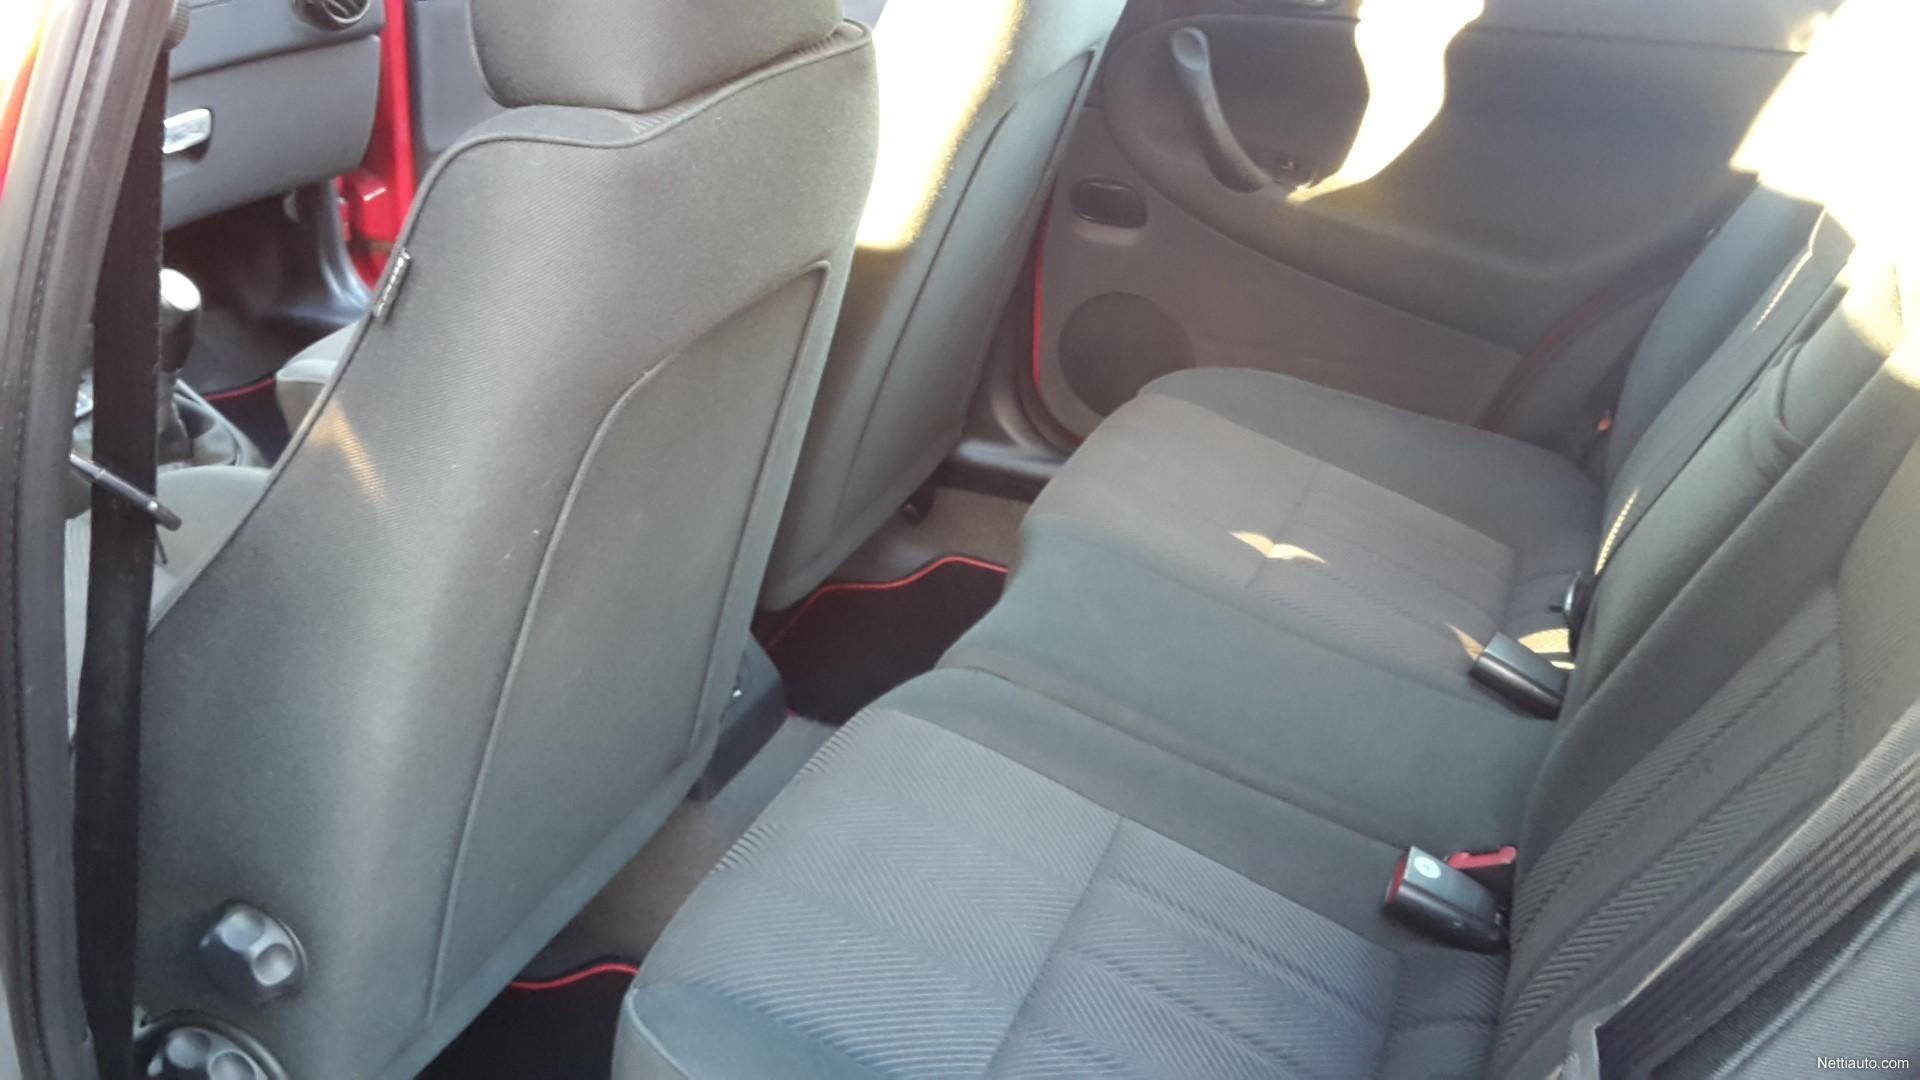 Alfa Romeo 147 2 0 150hv Distinctive 5d Hatchback 2004 Used